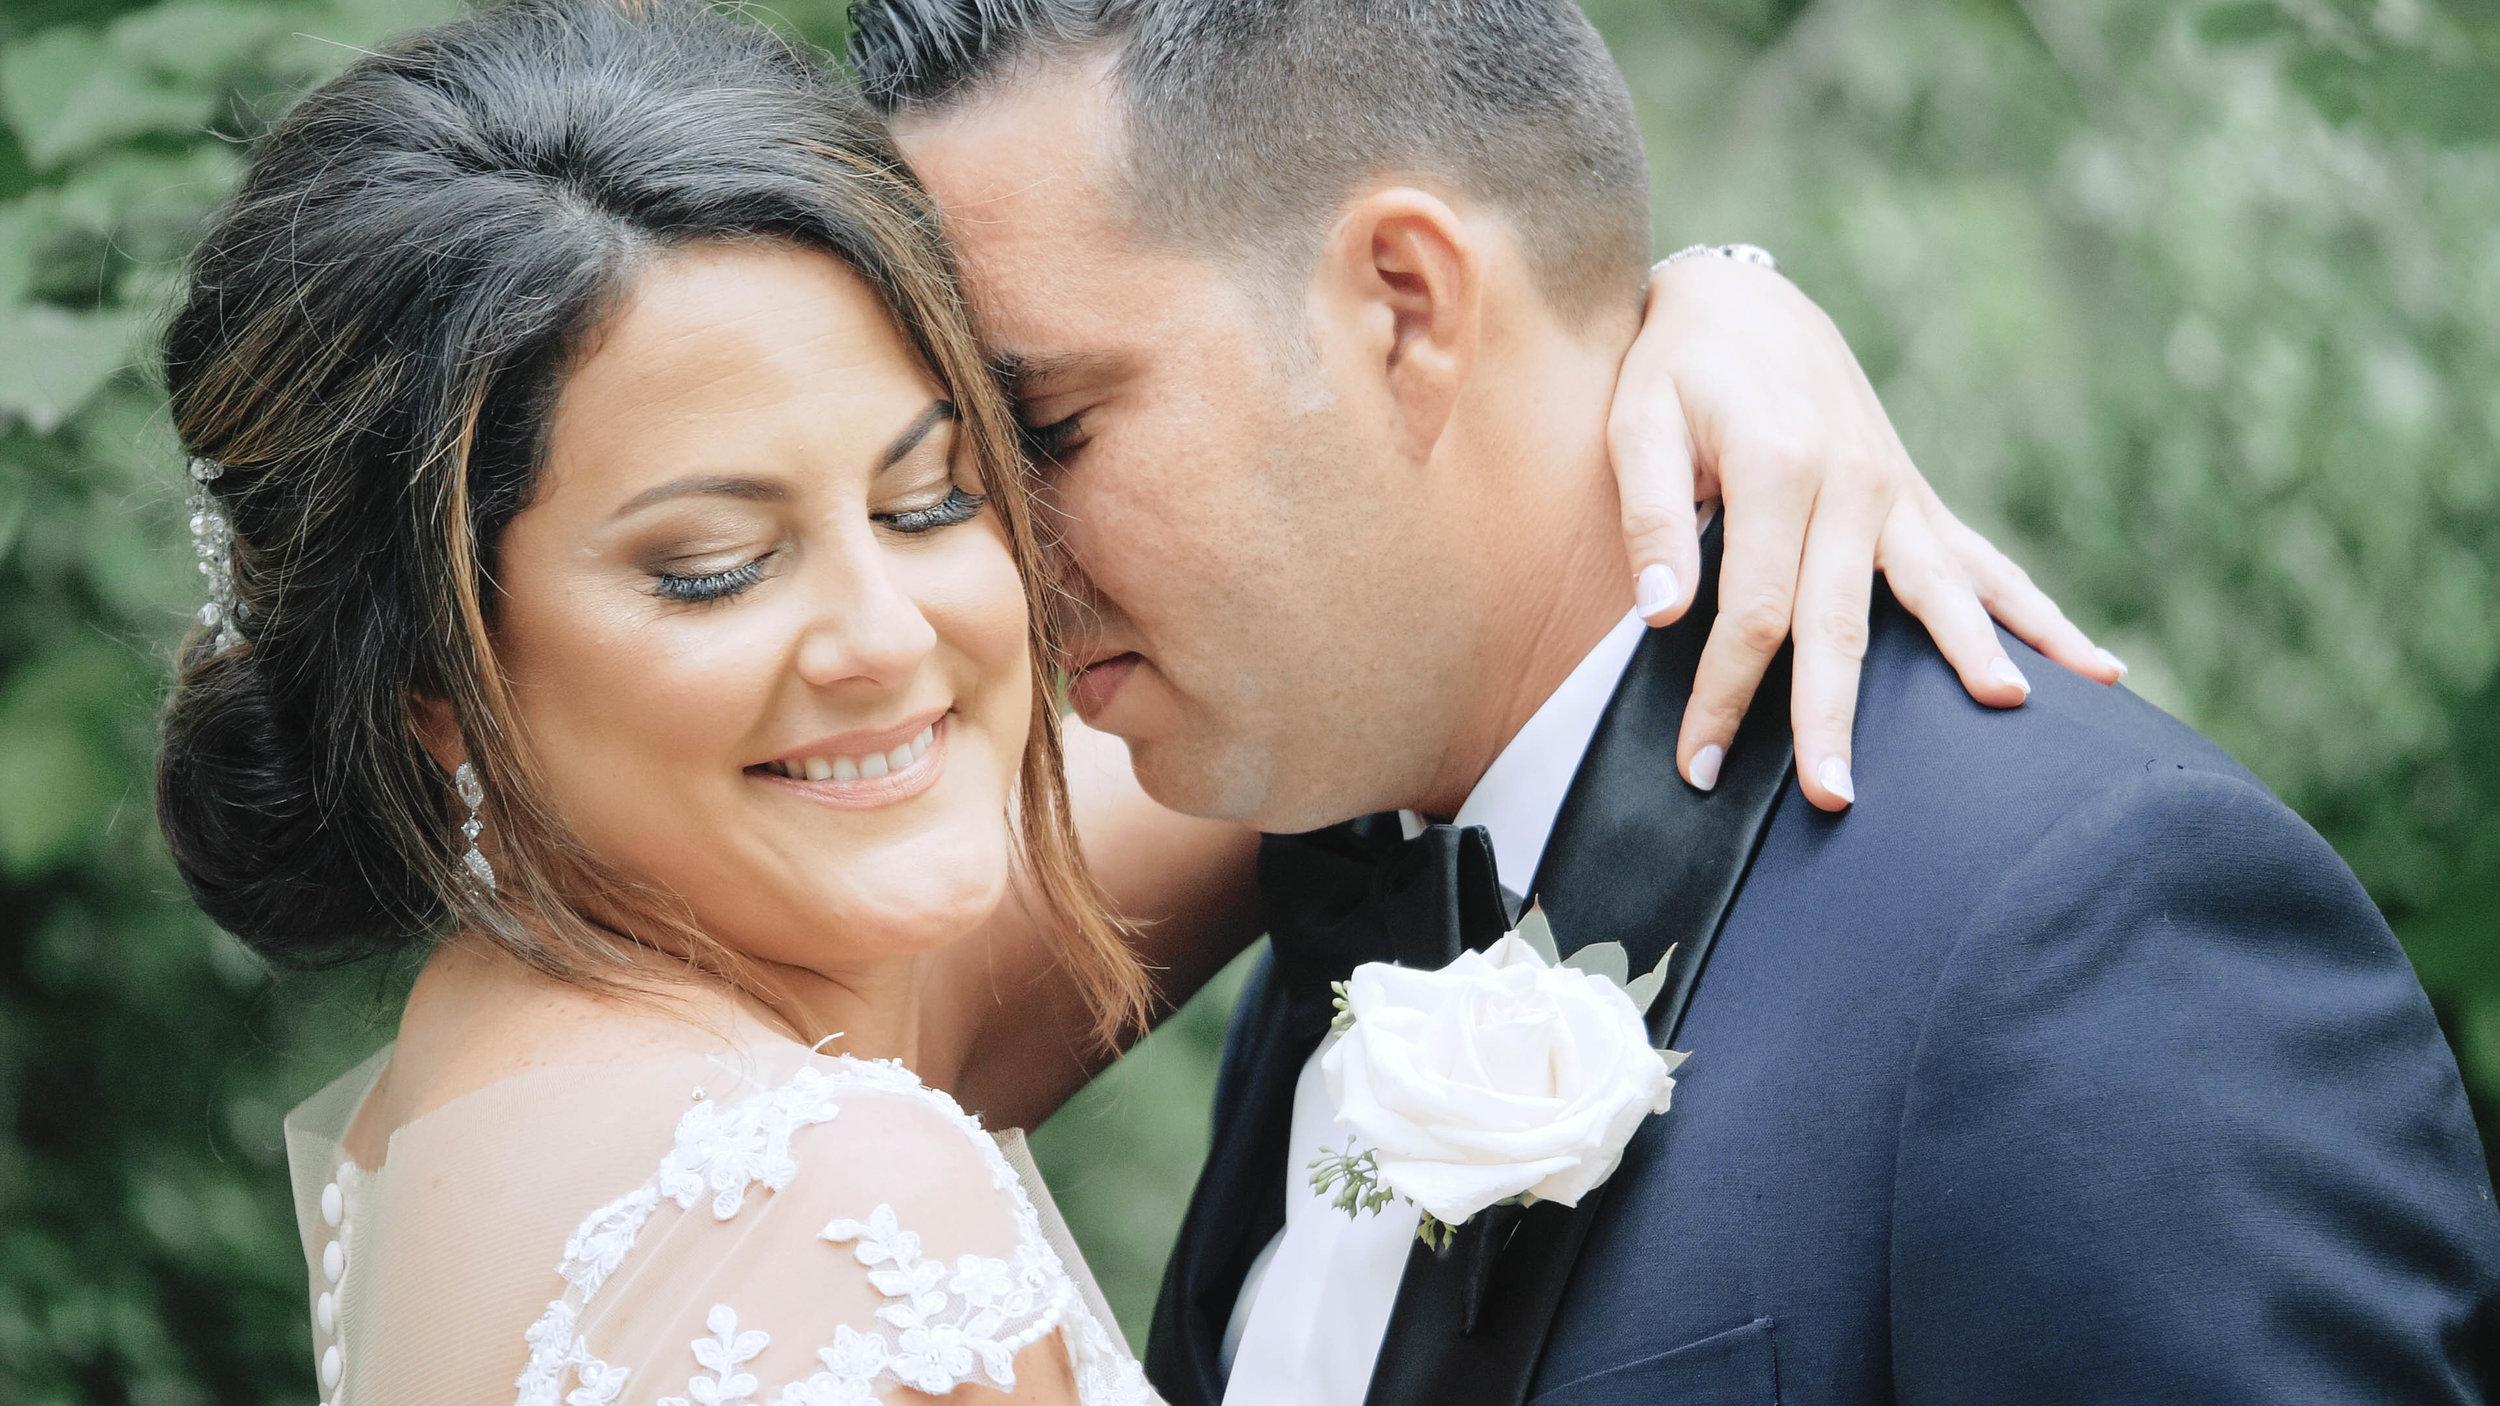 Tonemedia, NJ Wedding Videographer, NJ Wedding Videopgraphy, NJ Wedding Video